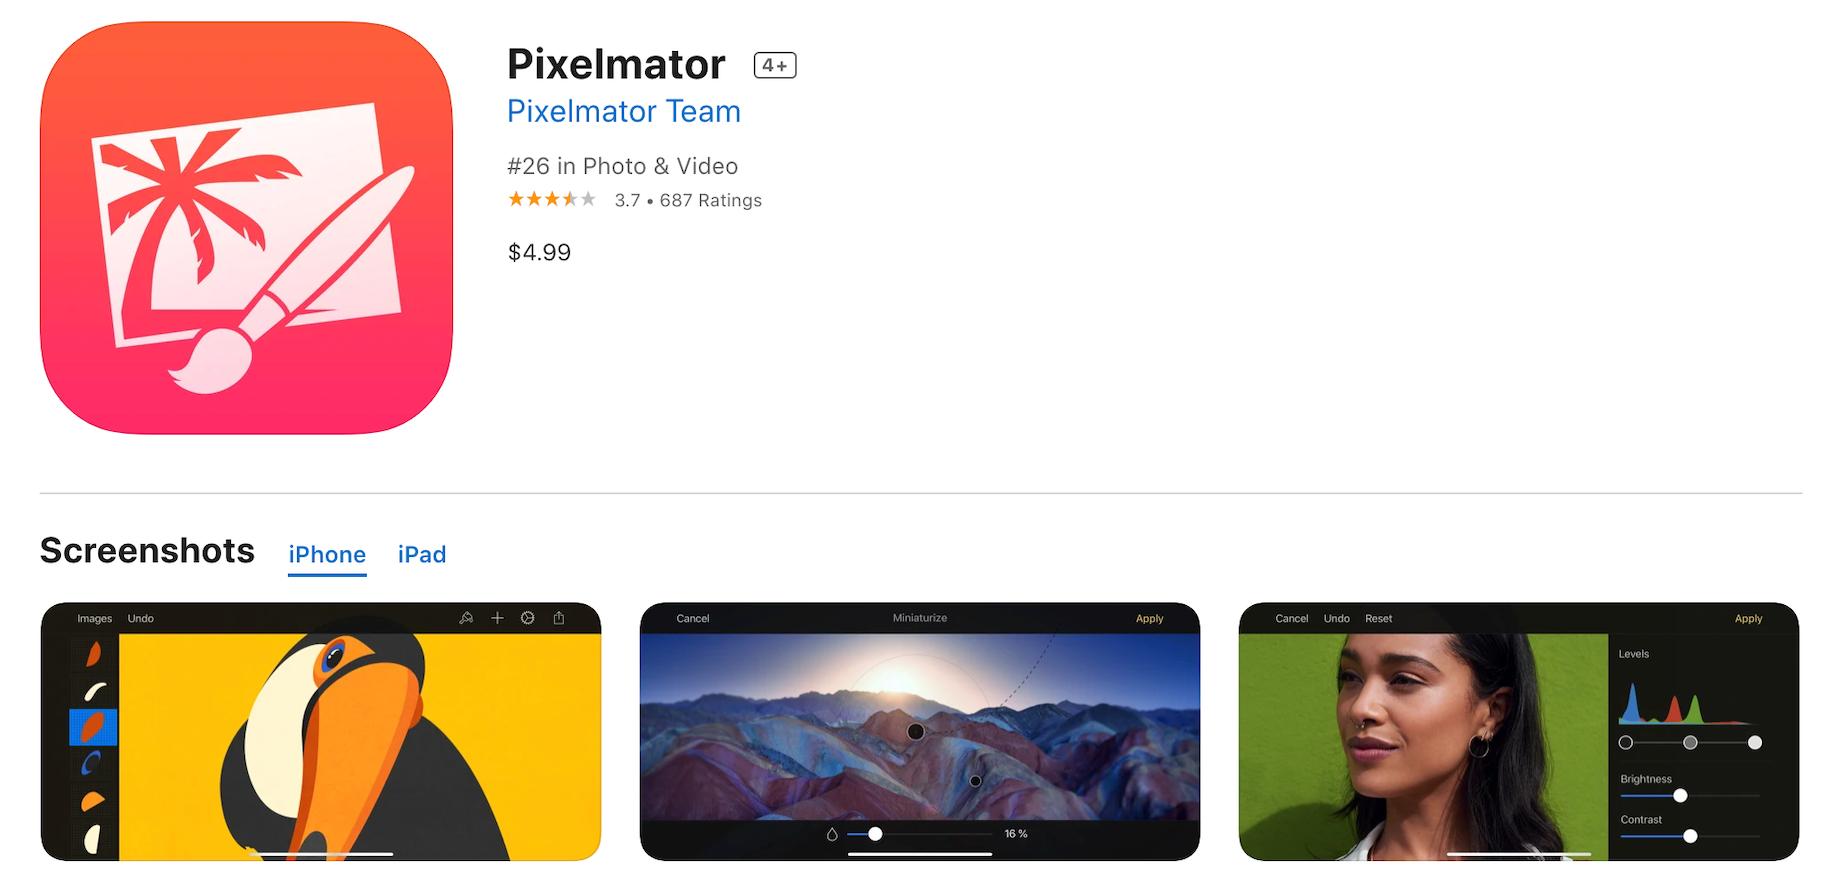 Pixelmator paid photo editor app